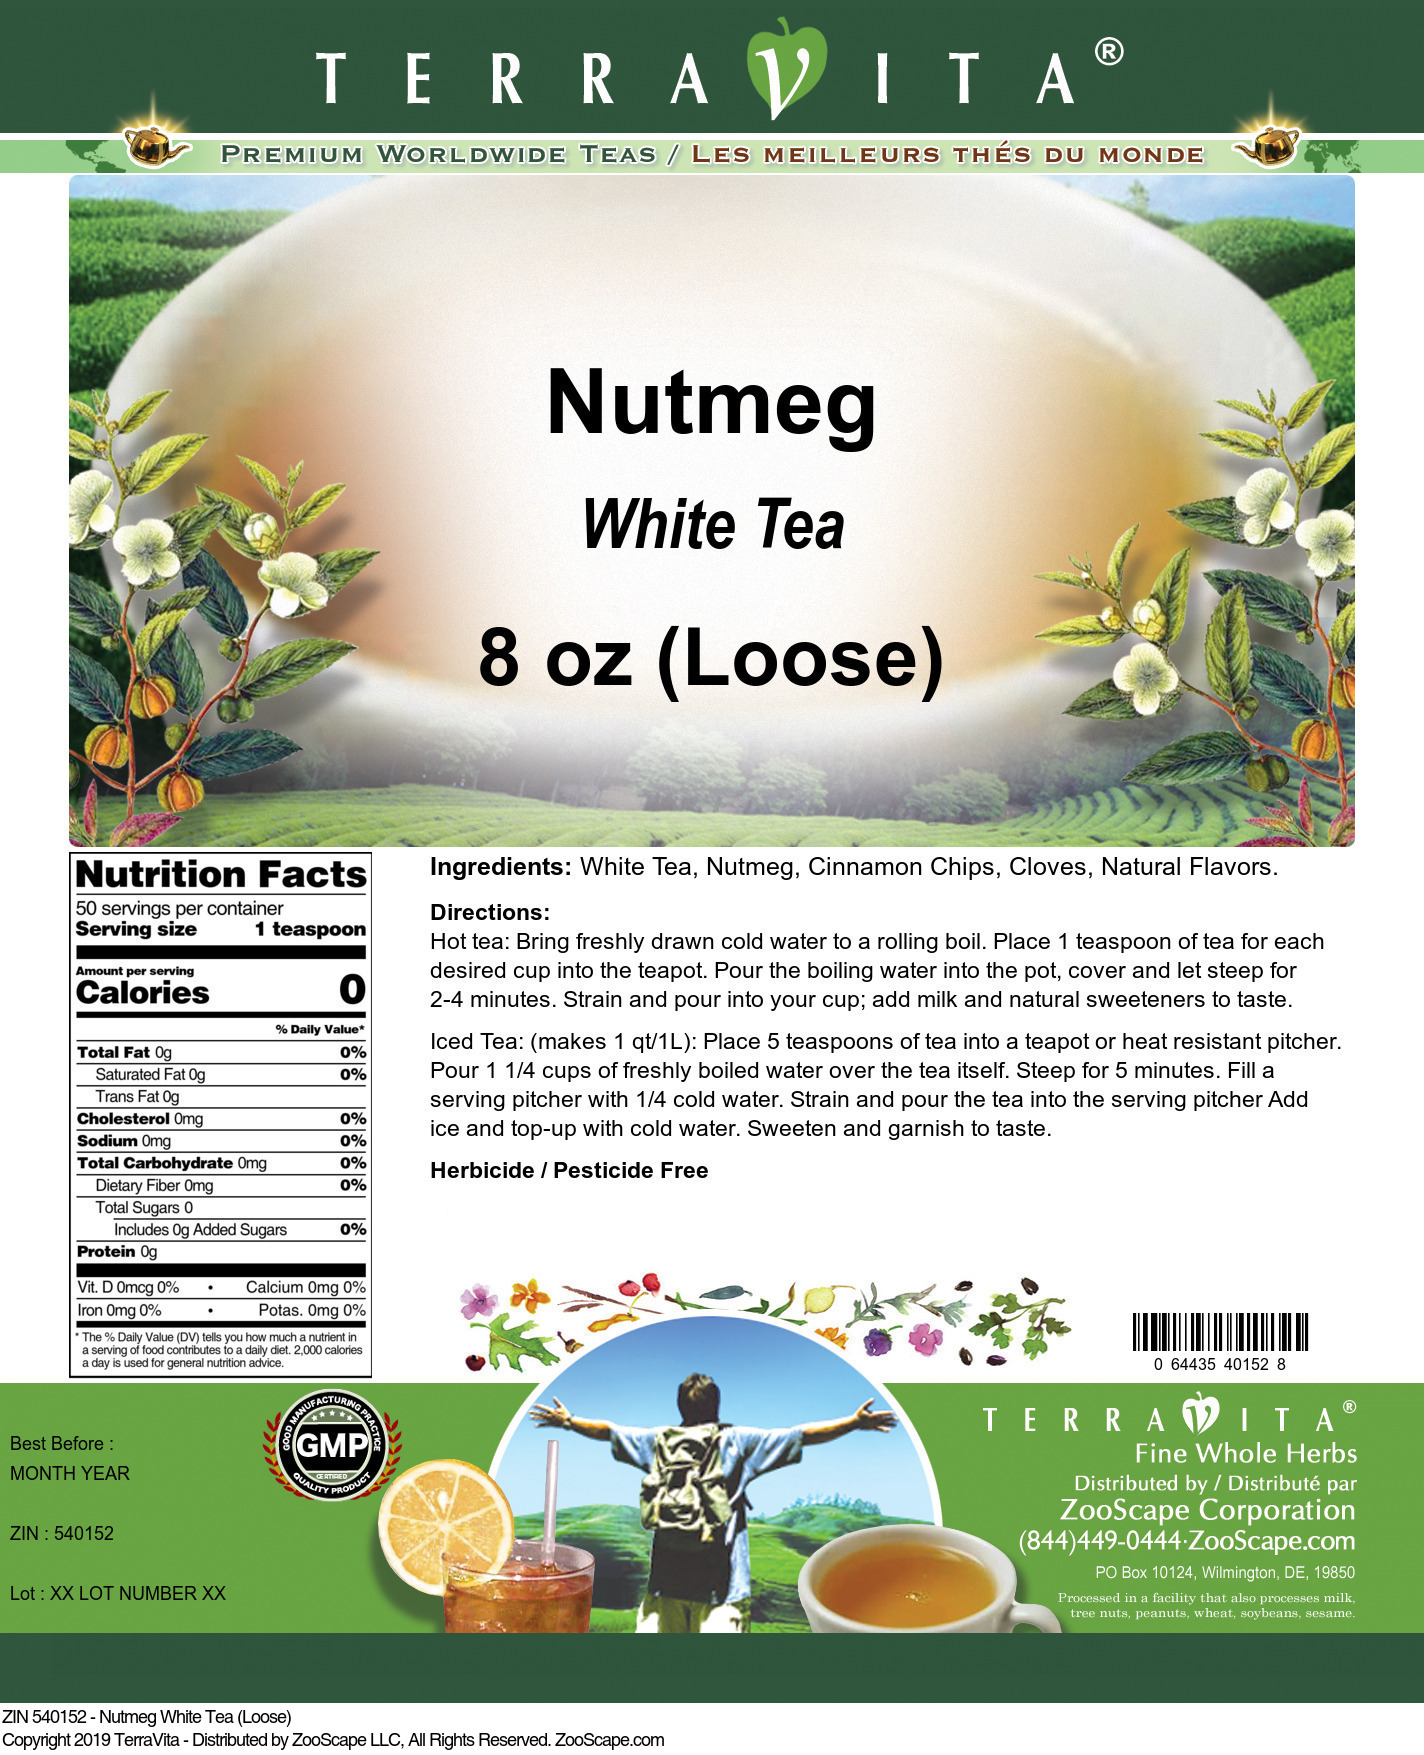 Nutmeg White Tea